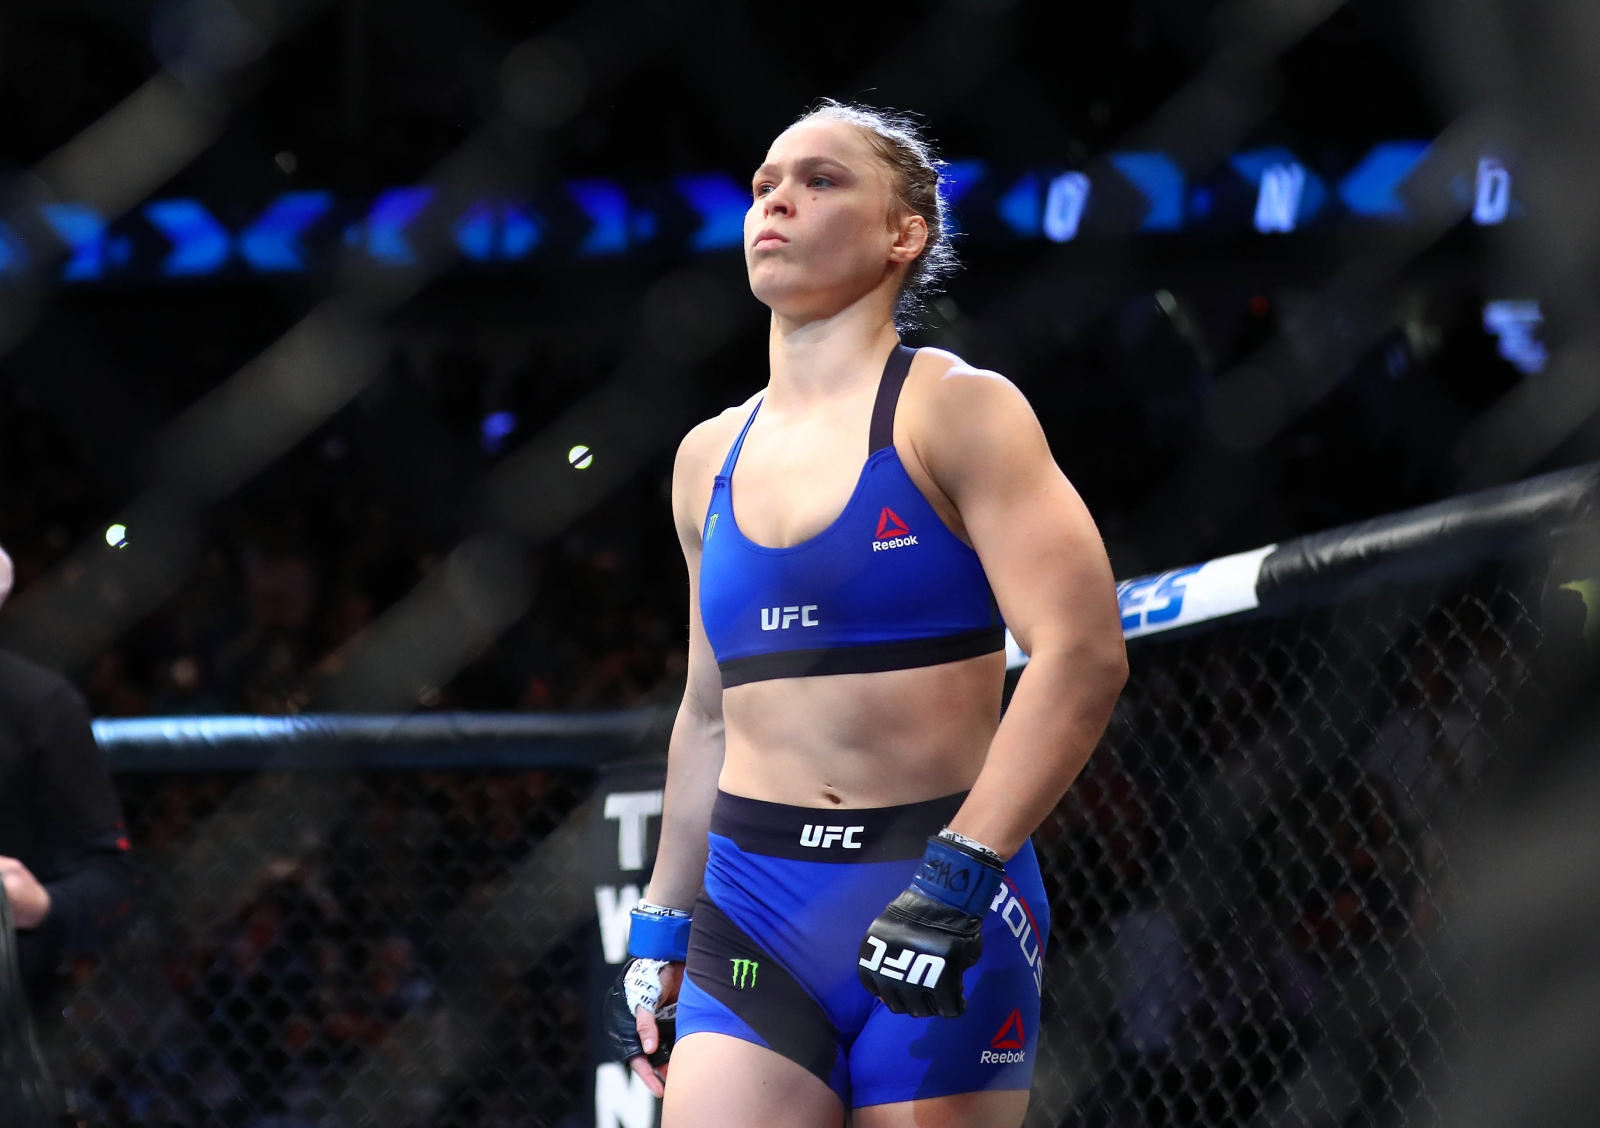 'I don't think so': Ronda Rousey UFC return unlikely, insists Dana White